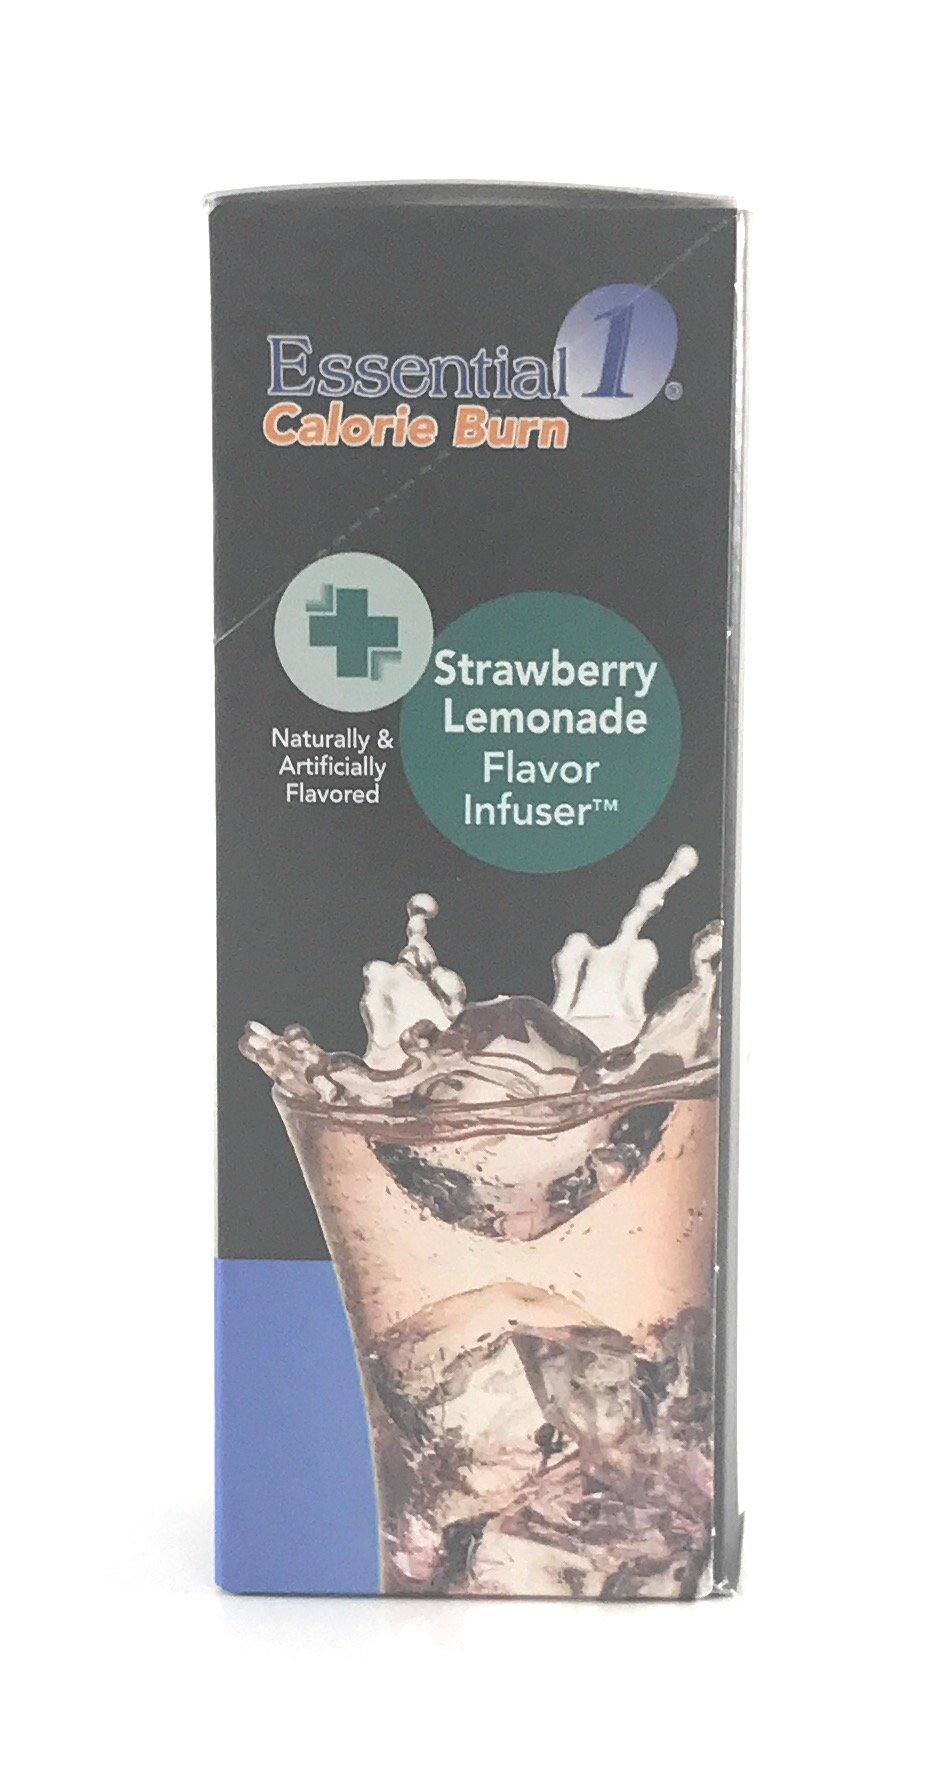 Medifast Essential1: Calorie Burn Strawberry Lemonade Flavor Infuser (1 Box/21 Servings) by Medifast (Image #3)